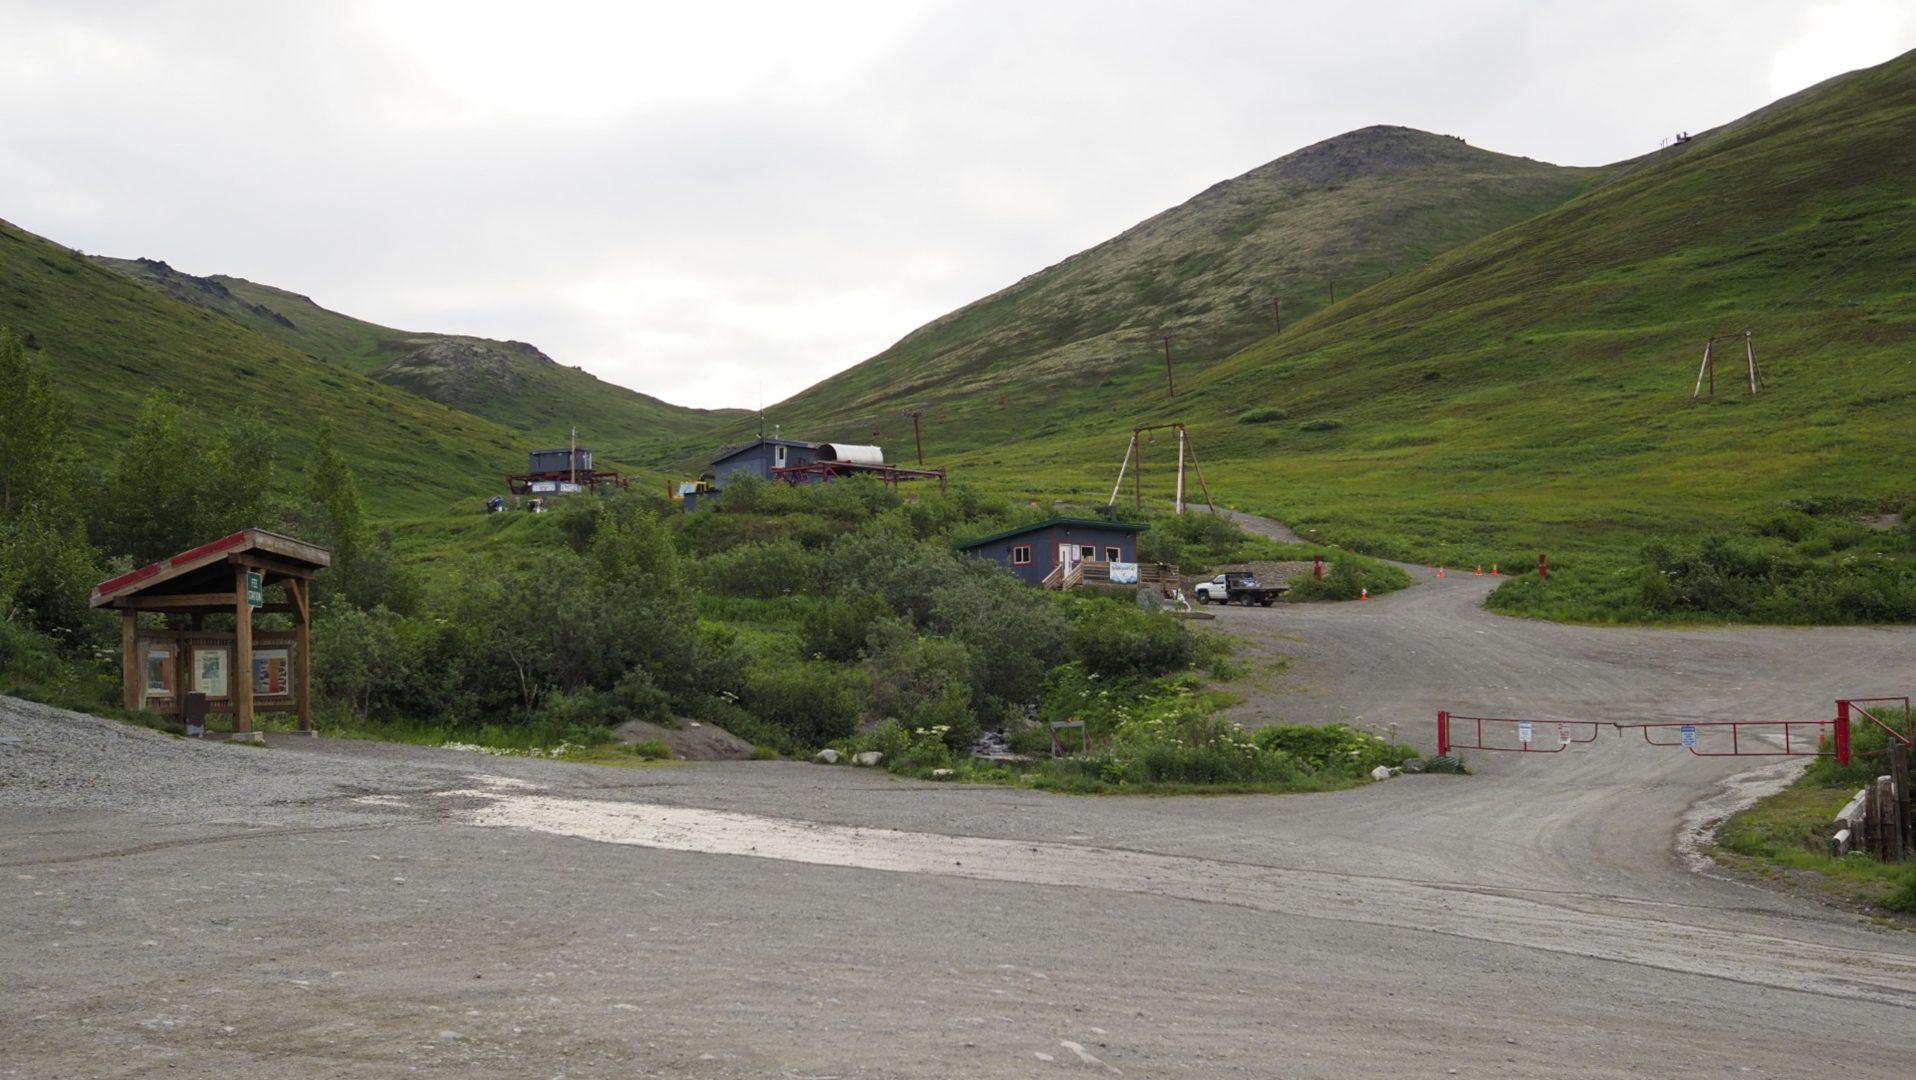 View of Arctic Valley Ski Area